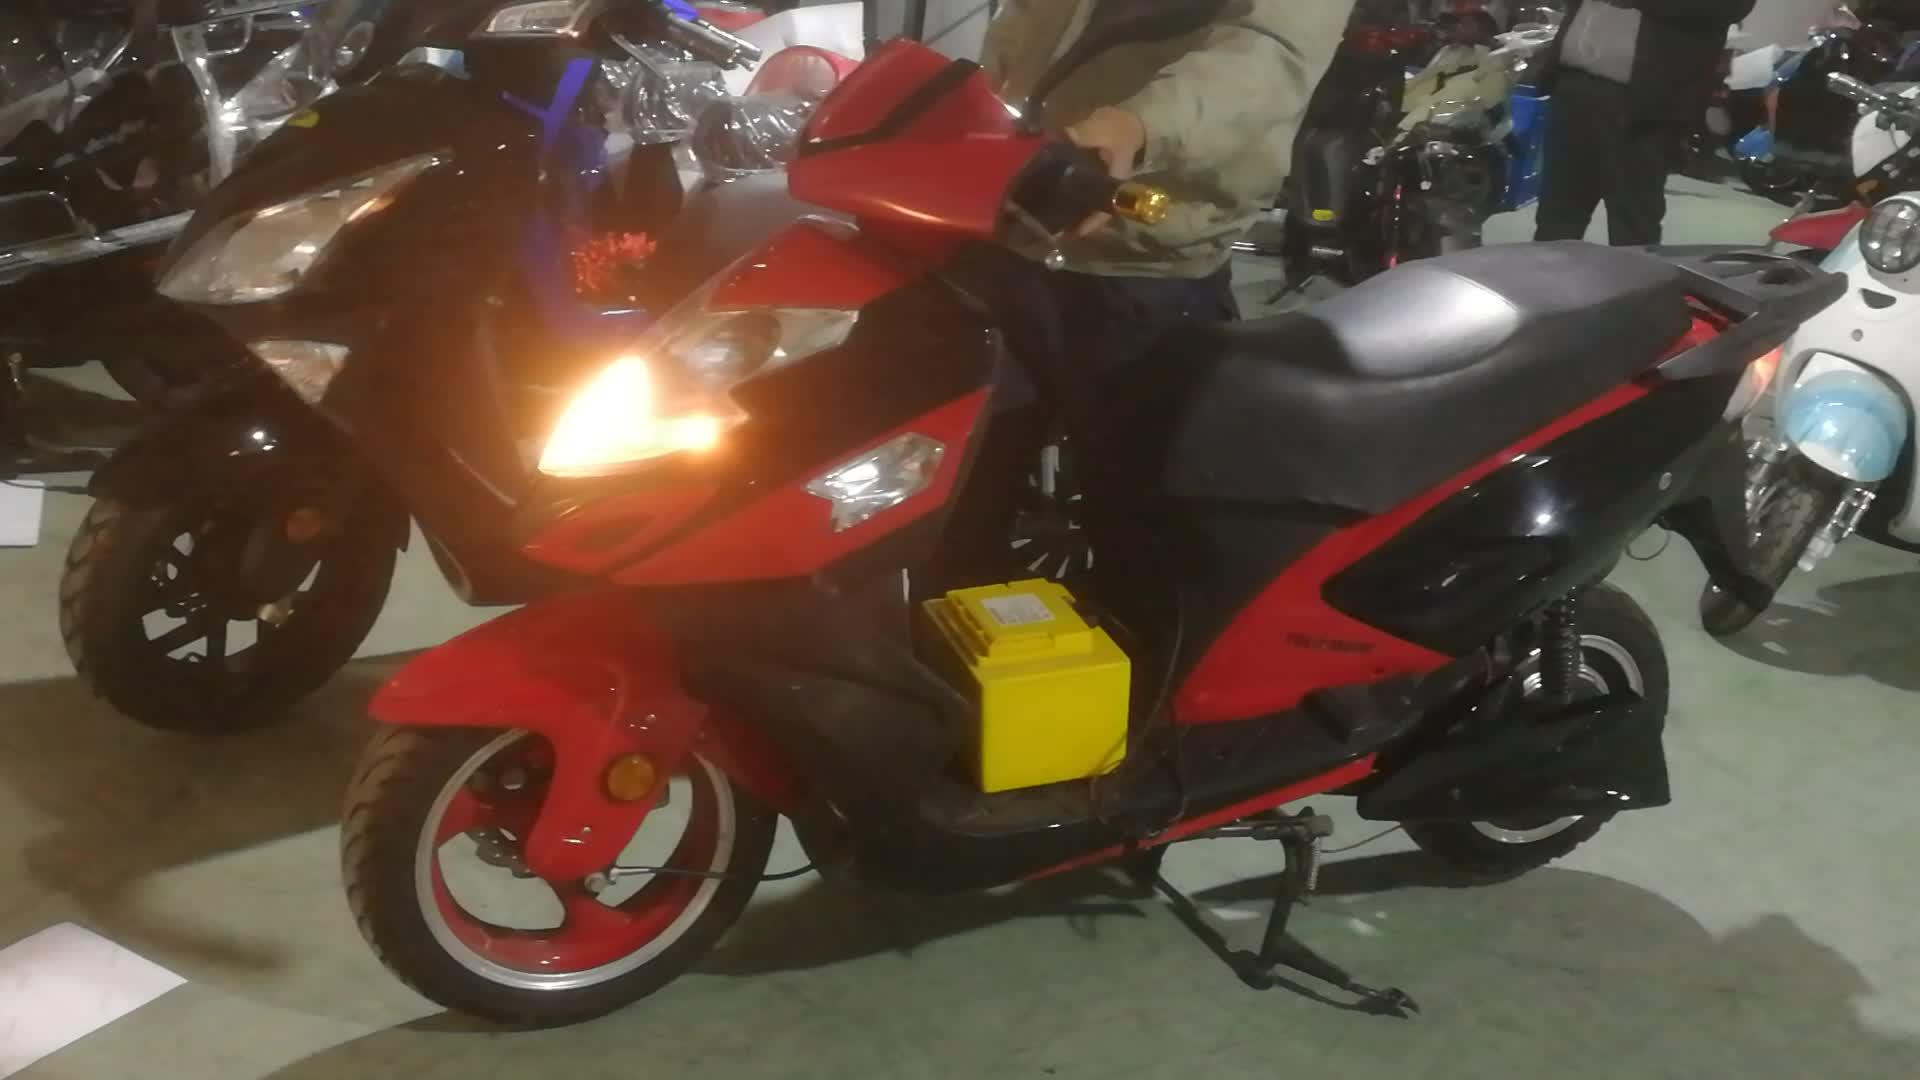 130/60/13, 13060 13 шин скутер, мотоциклы аккумулятор, 1000 w baterias para bicicletas baratas electricas заездов electricas